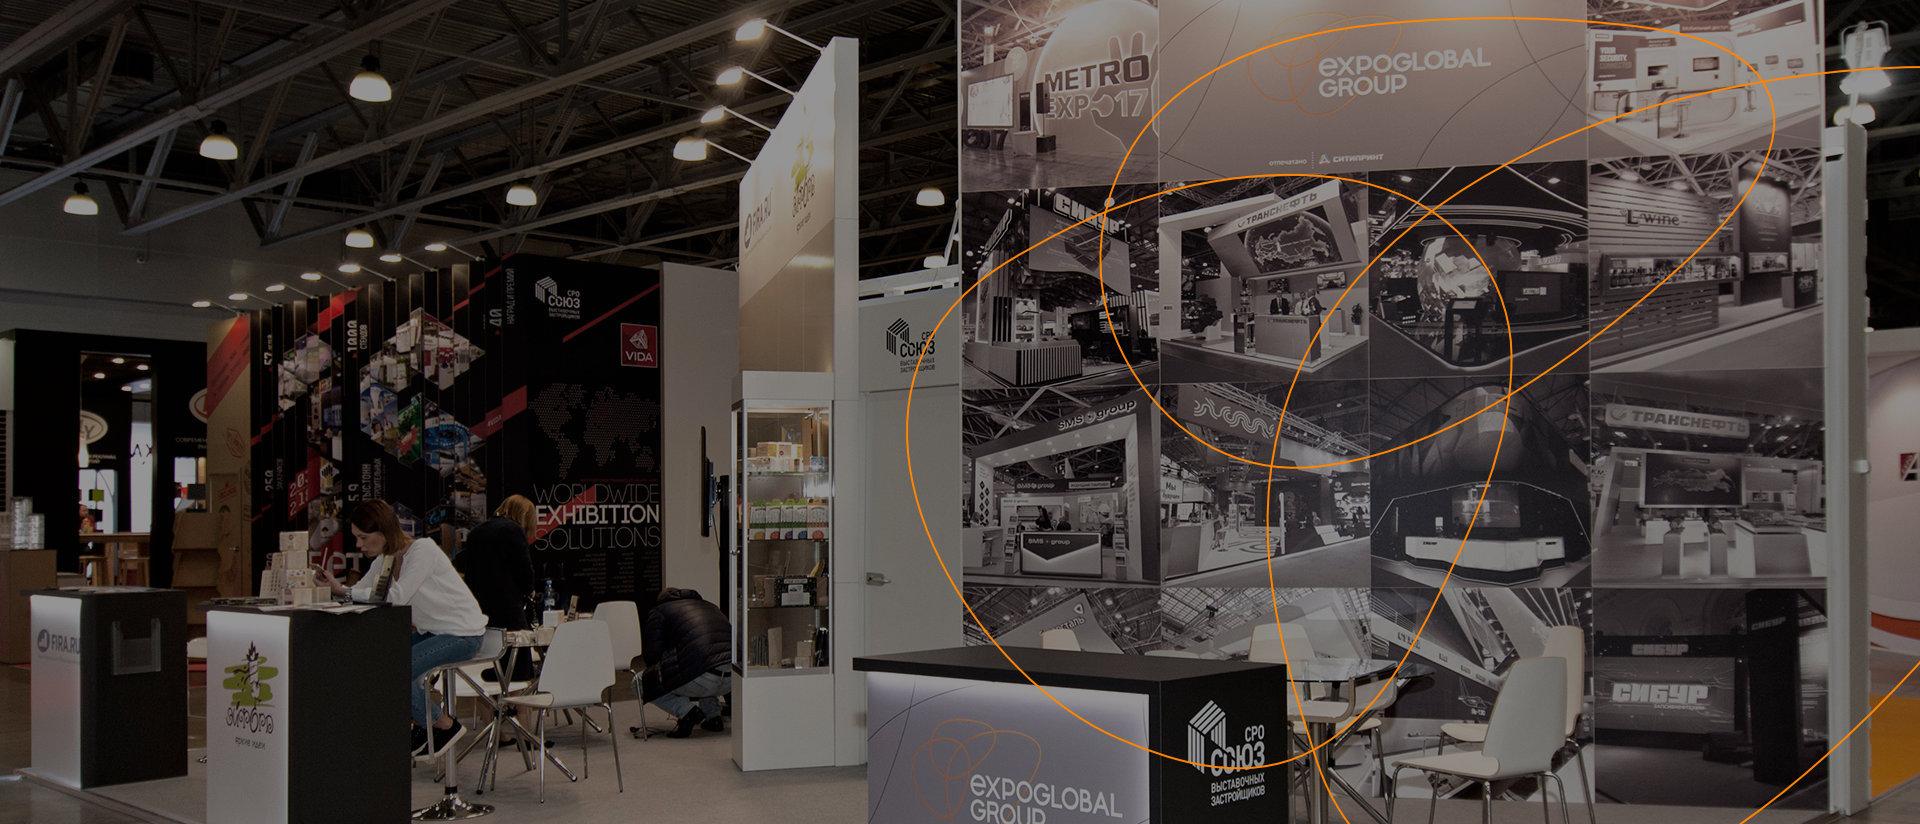 ExpoGlobal Group Antwerp Contact